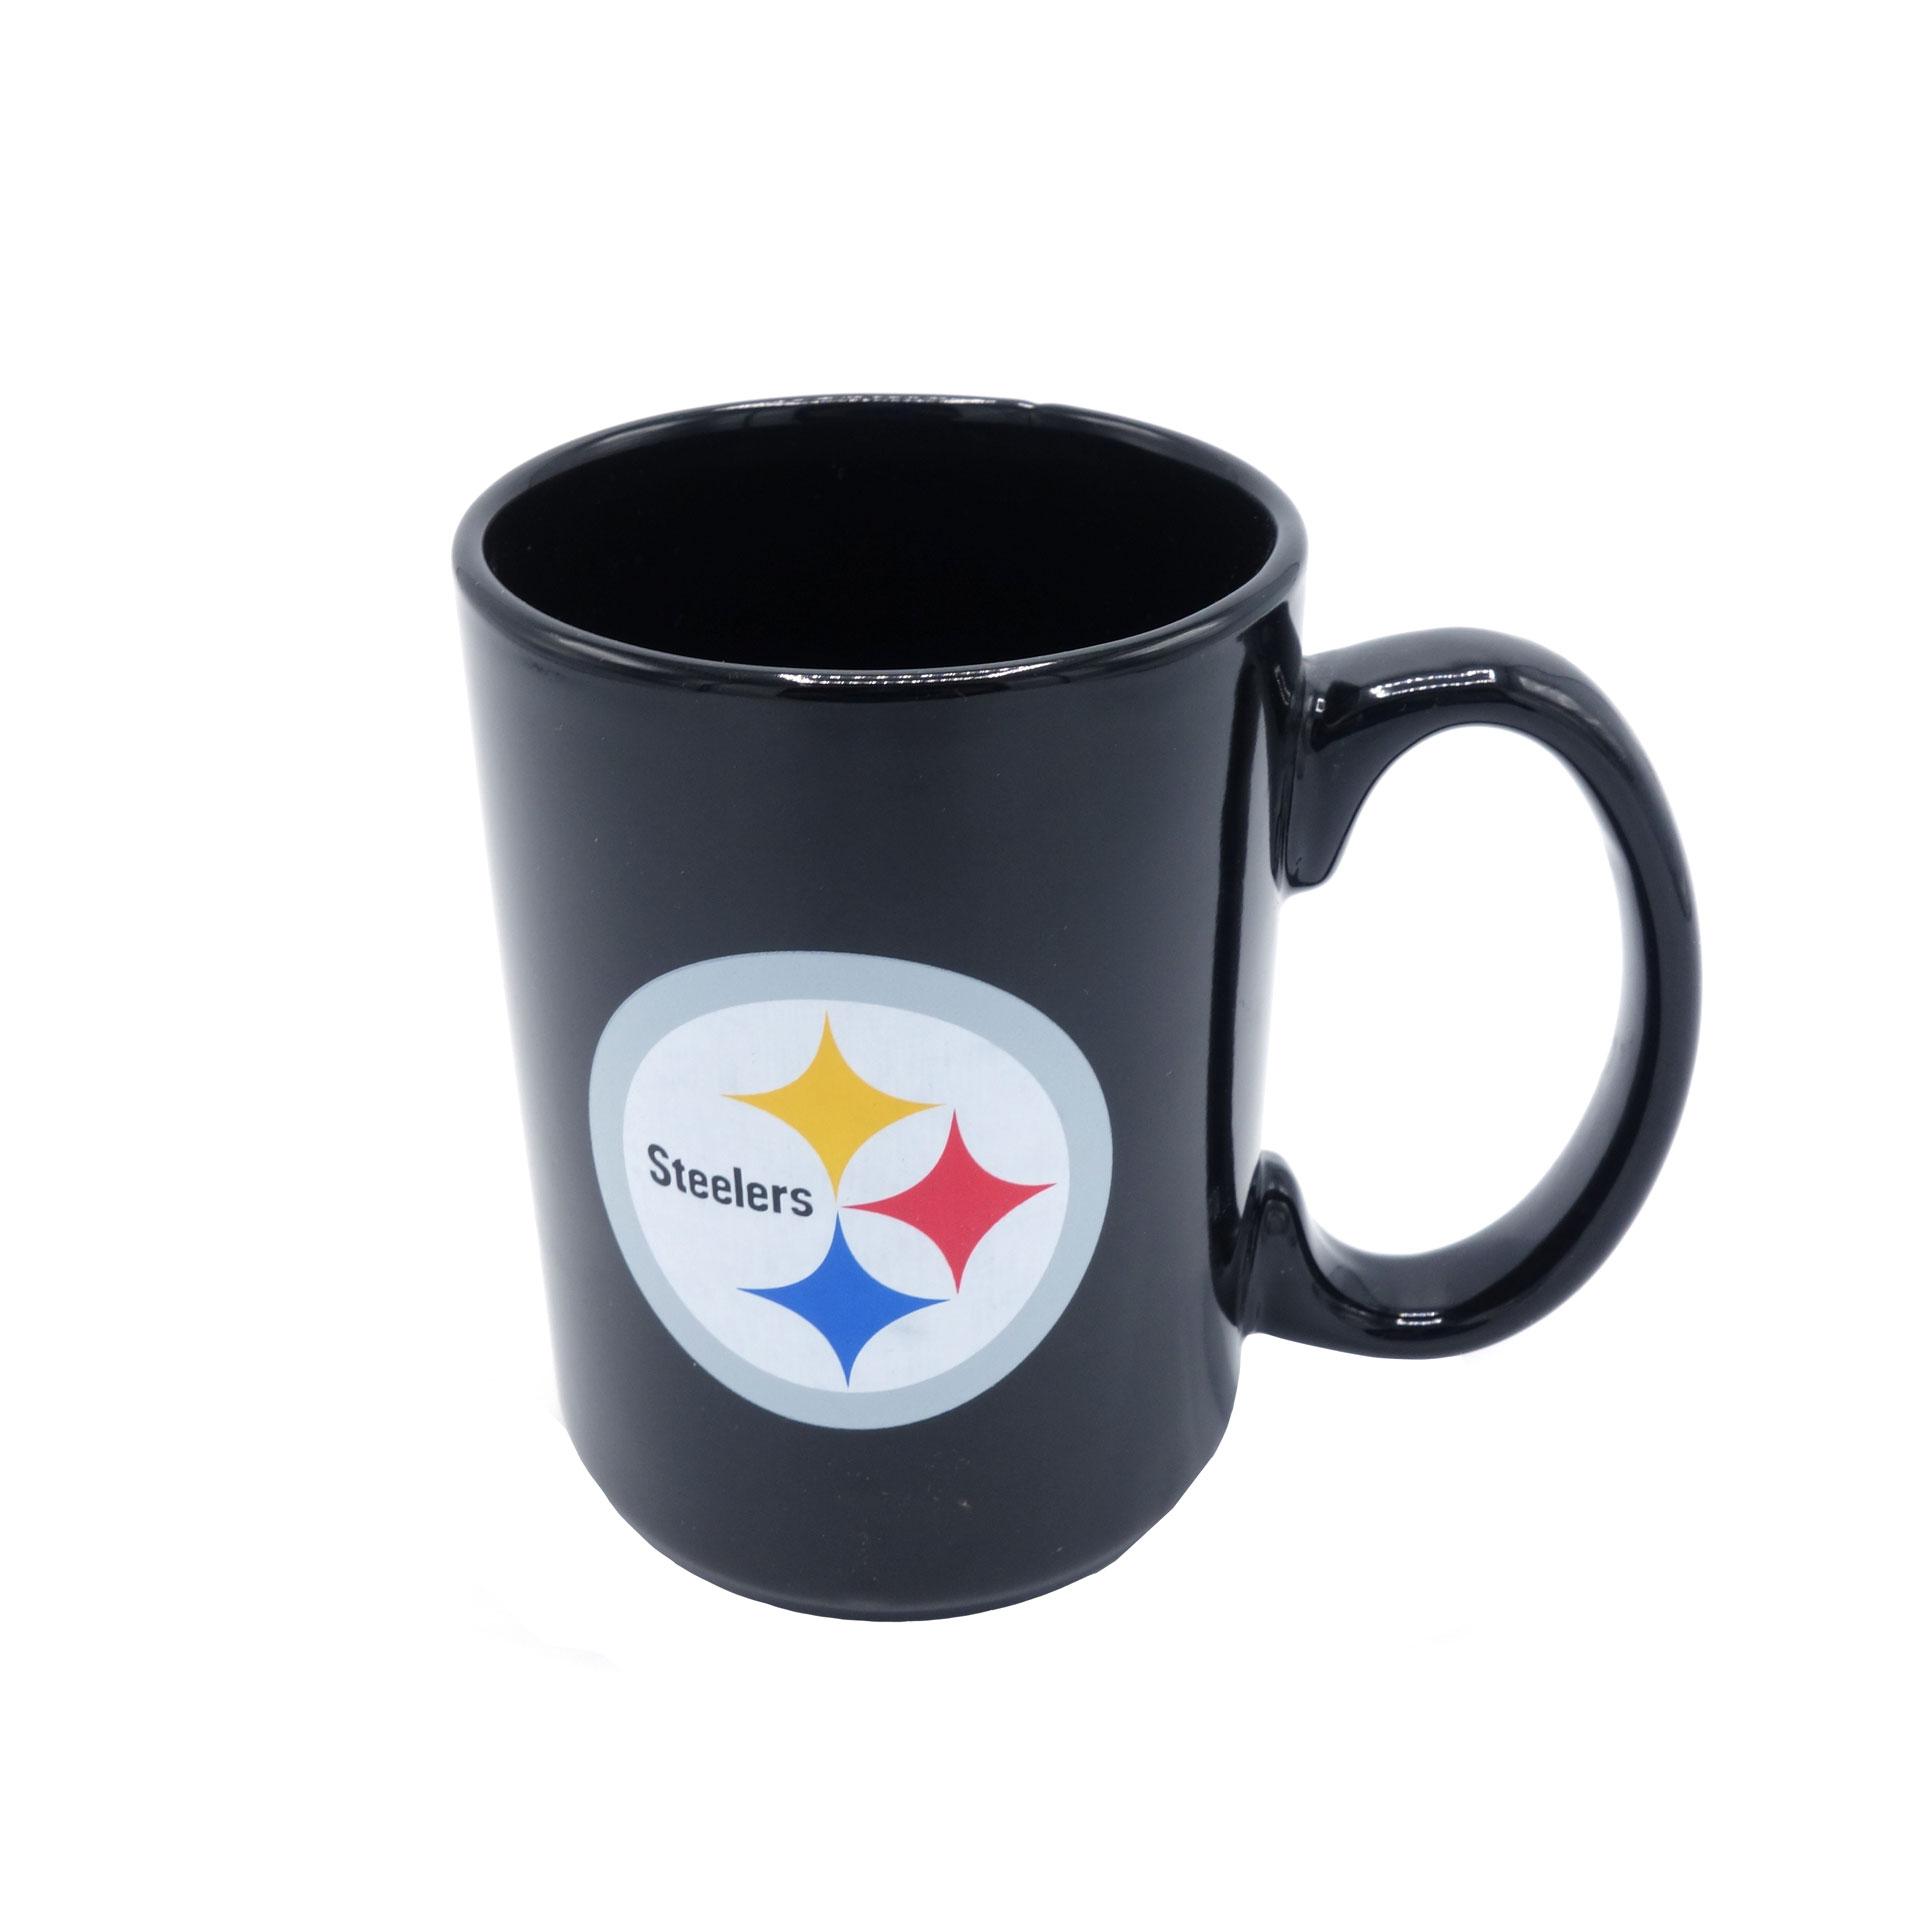 NFL Pittsburgh Steelers Tasse schwarz